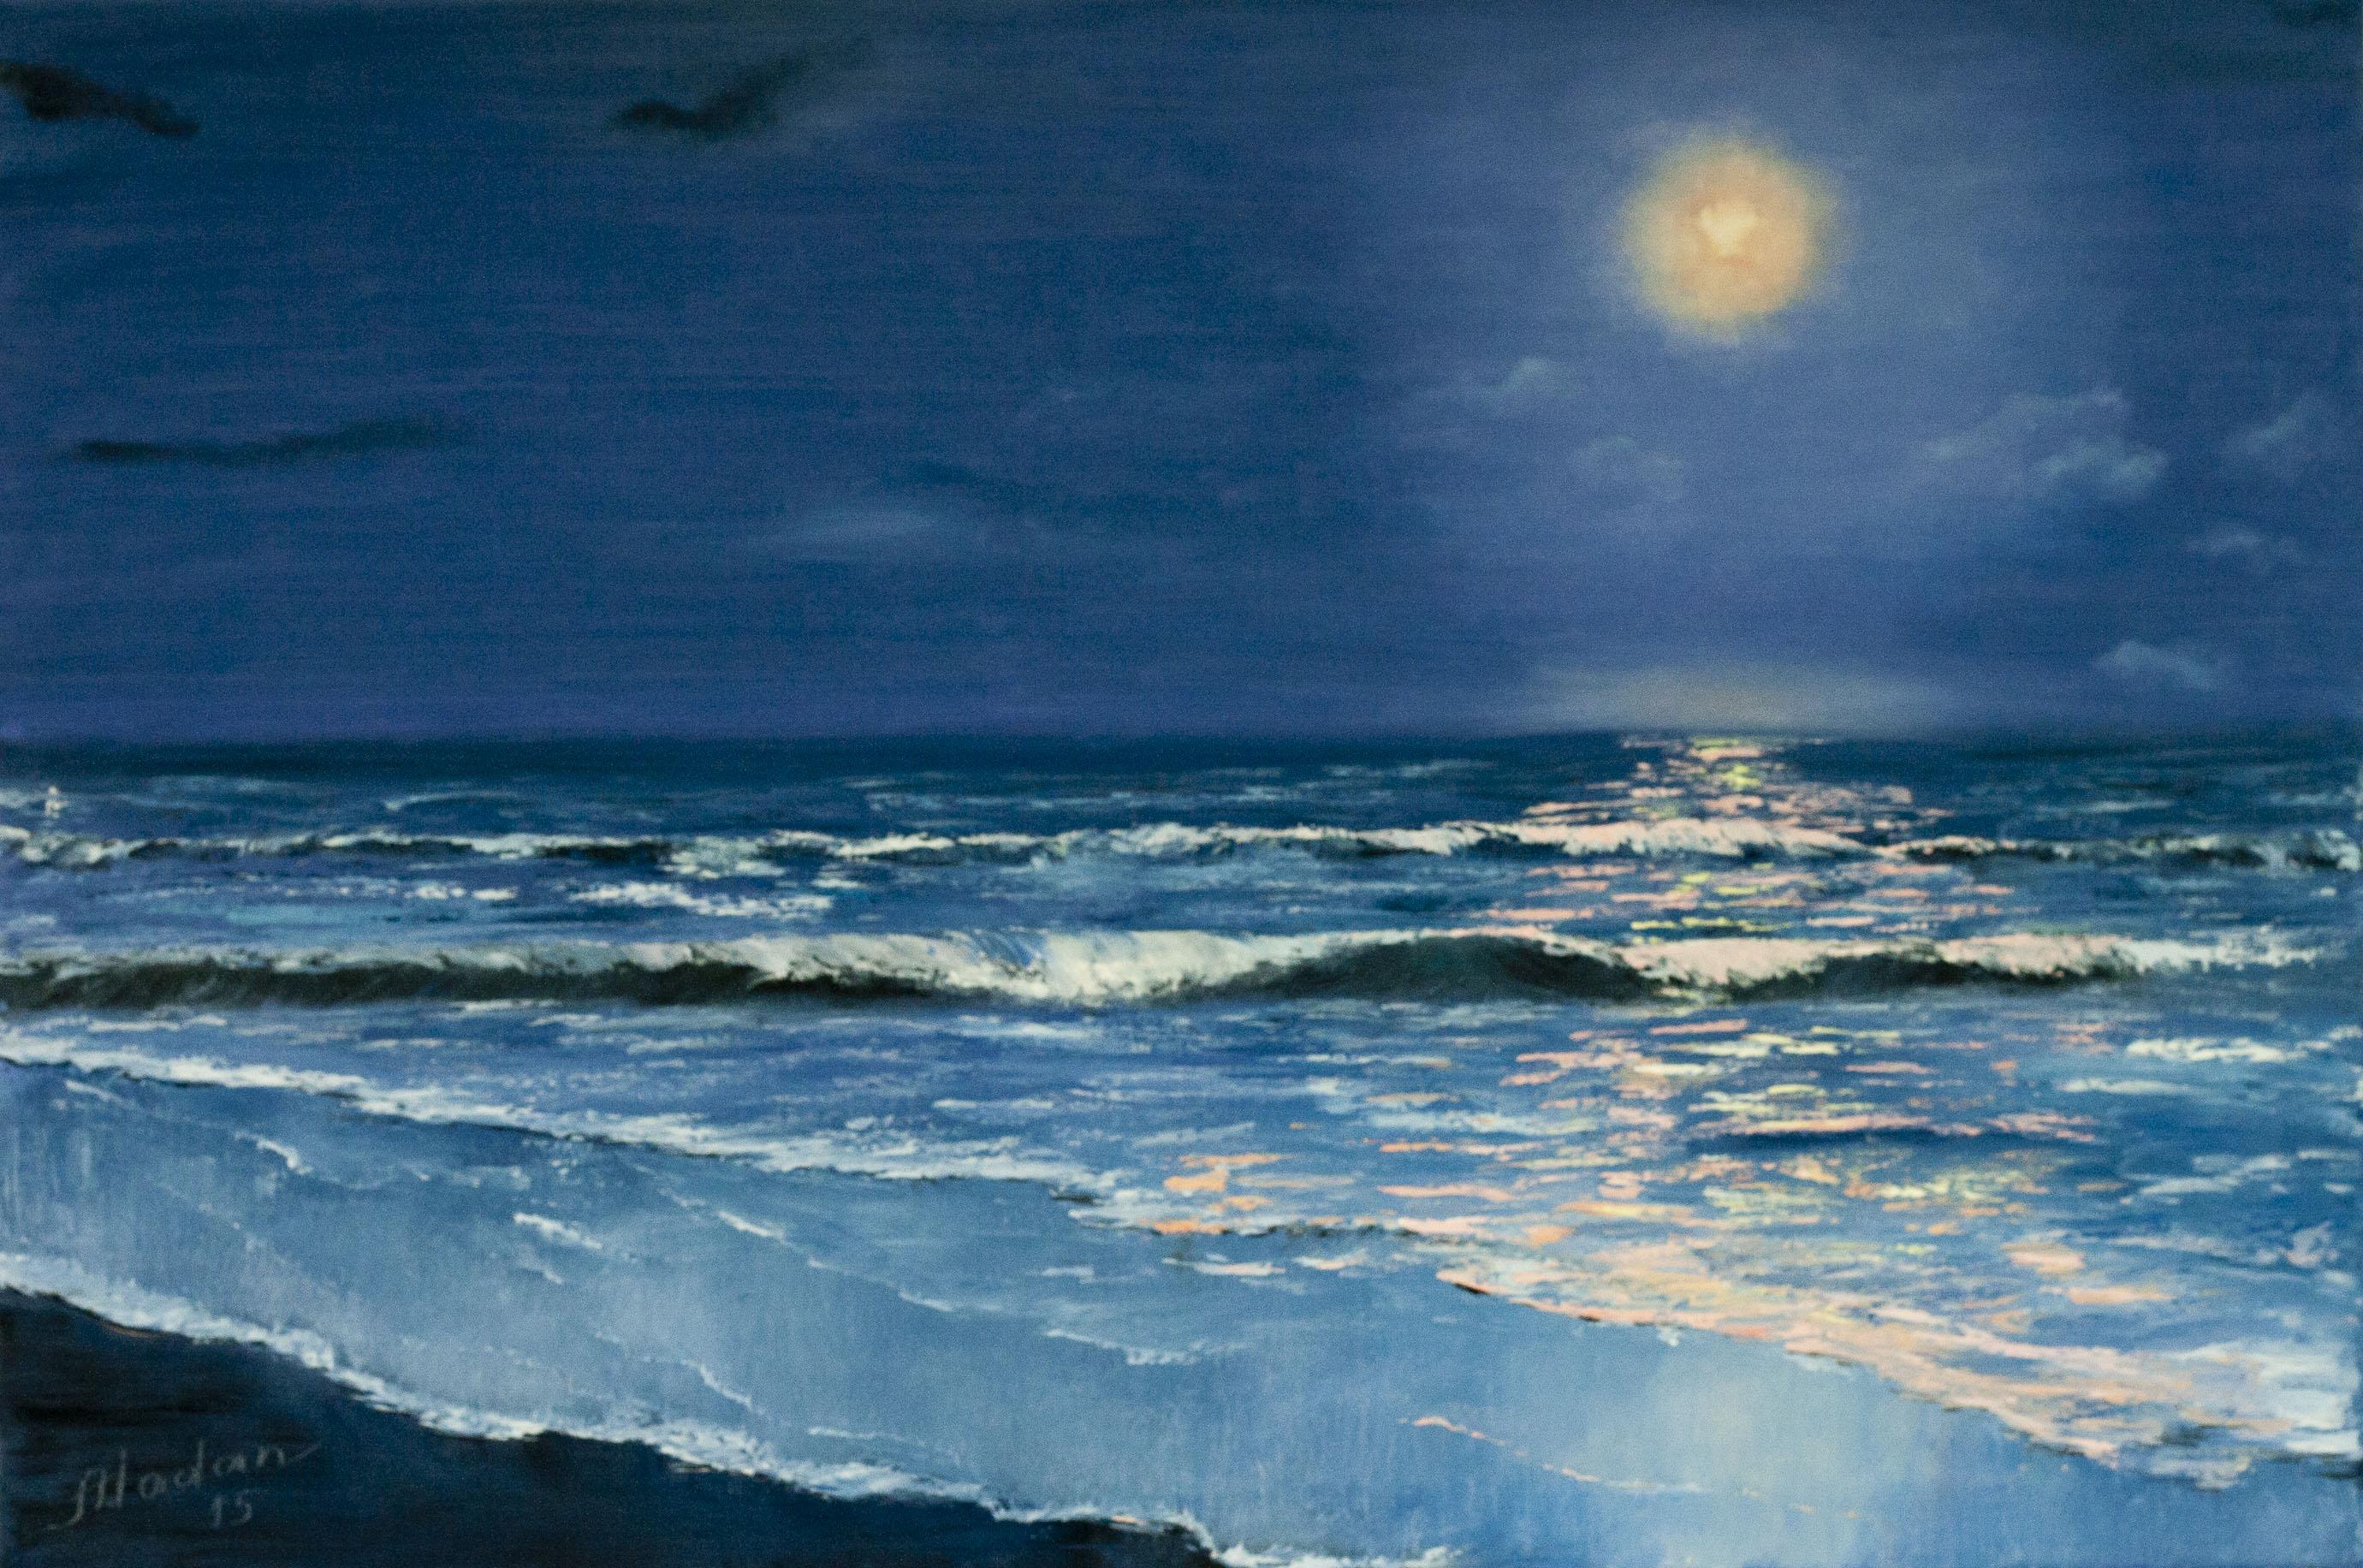 Moonlight sonata | I Learn Painting